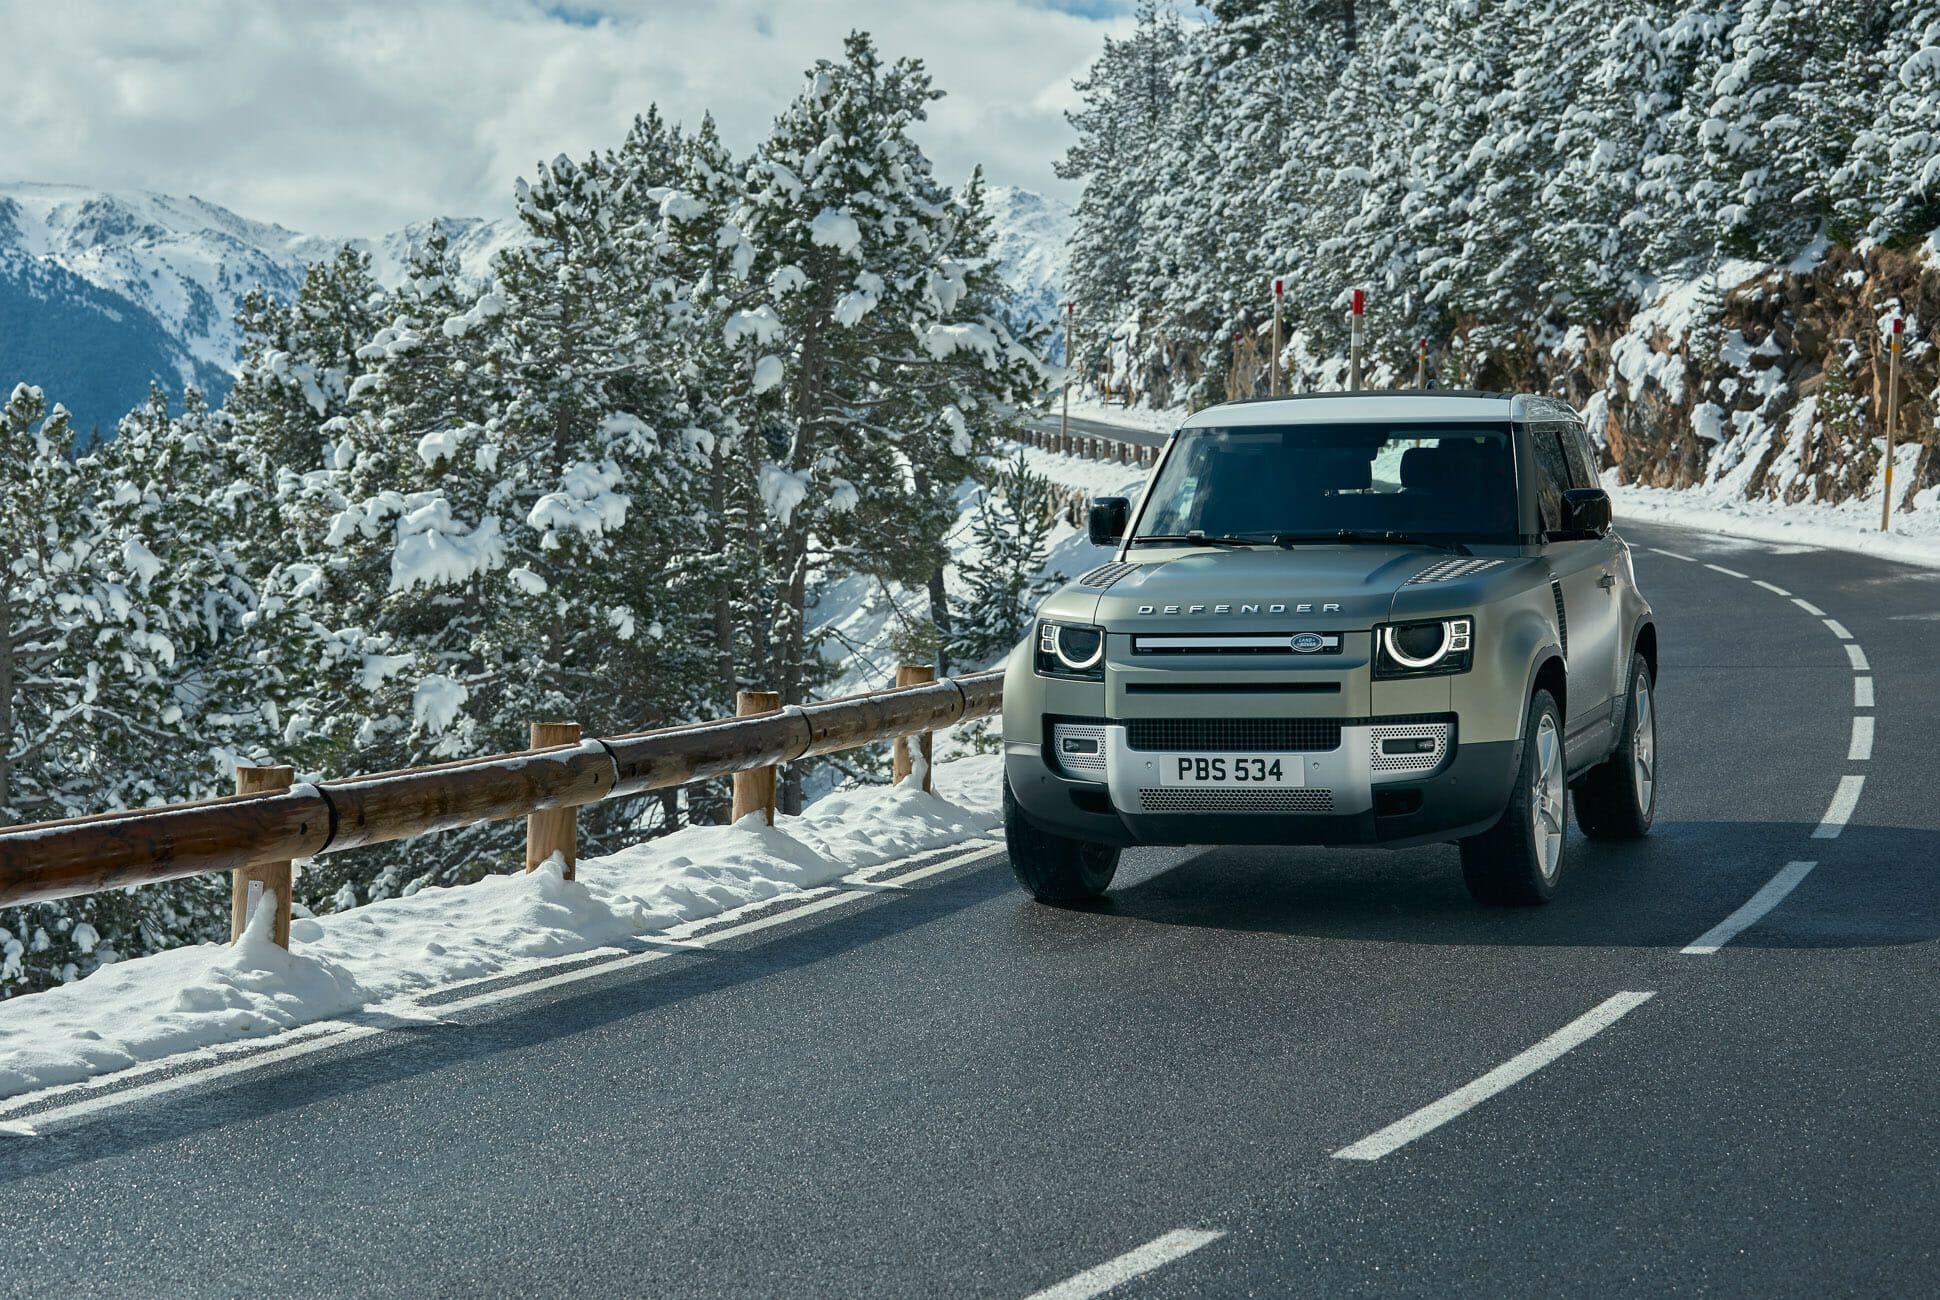 Land Rover Defender Gear Patrol-Exterior Action-Slide-06